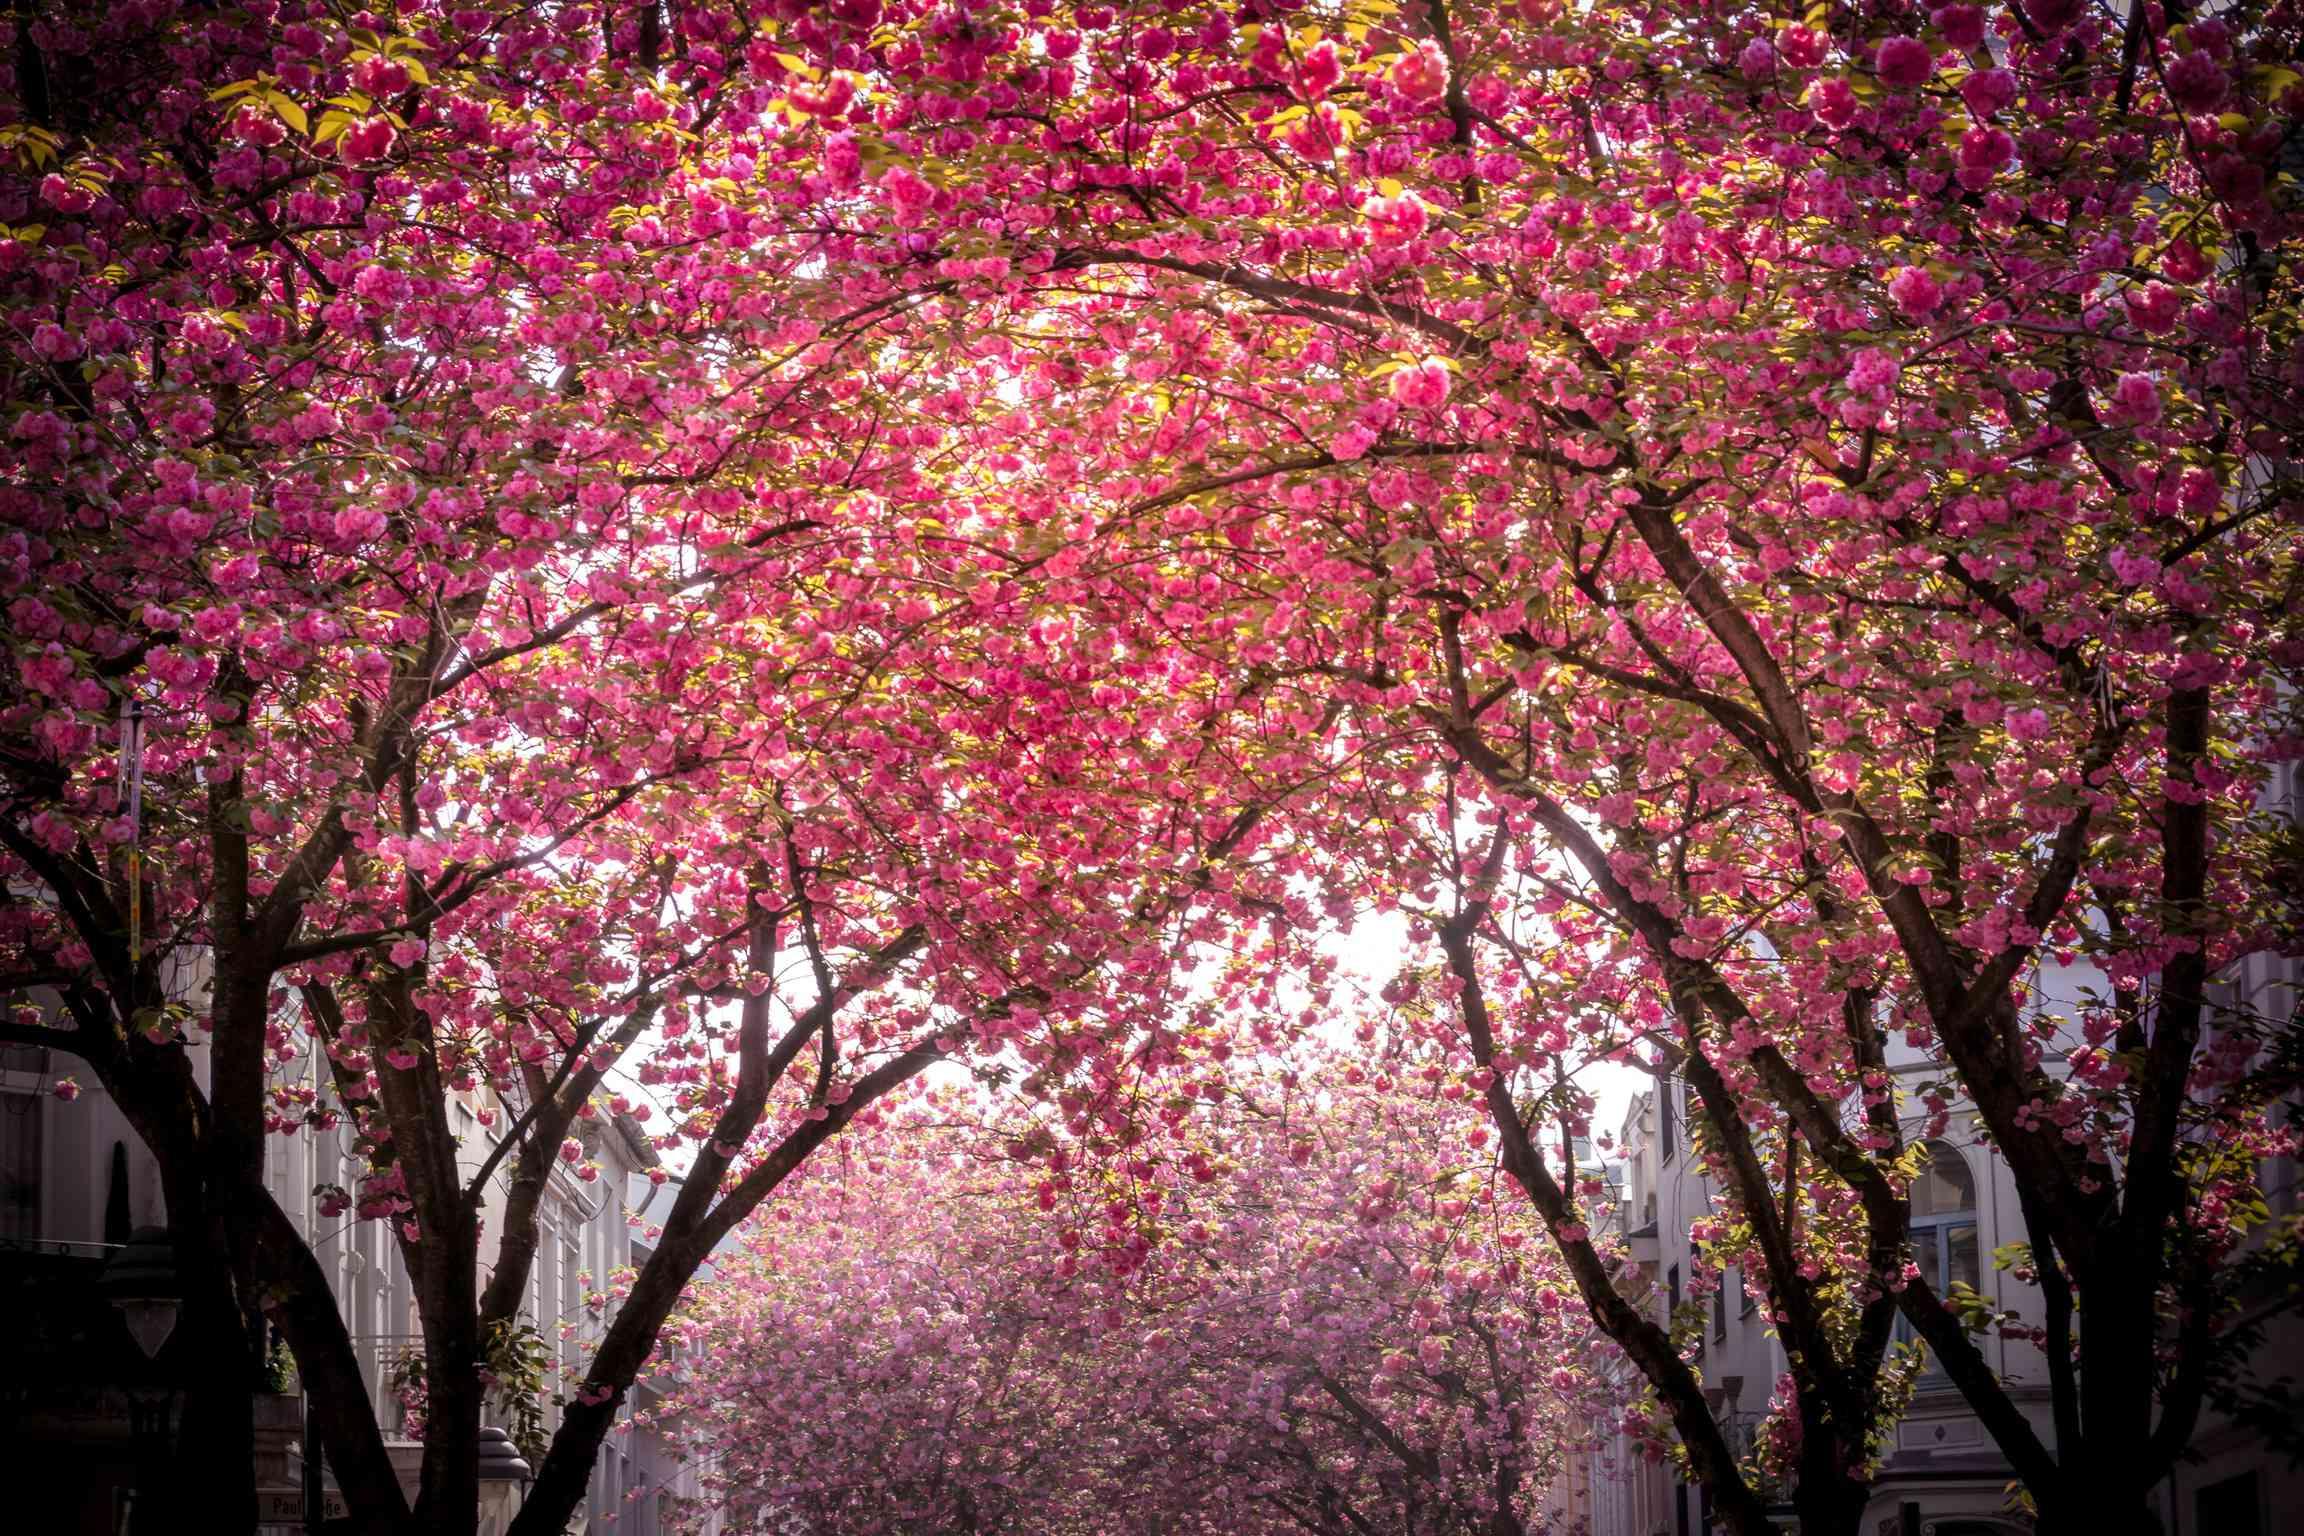 Tall, full cherry blossom trees in full pink bloom on a residential street in Bonn, Germany